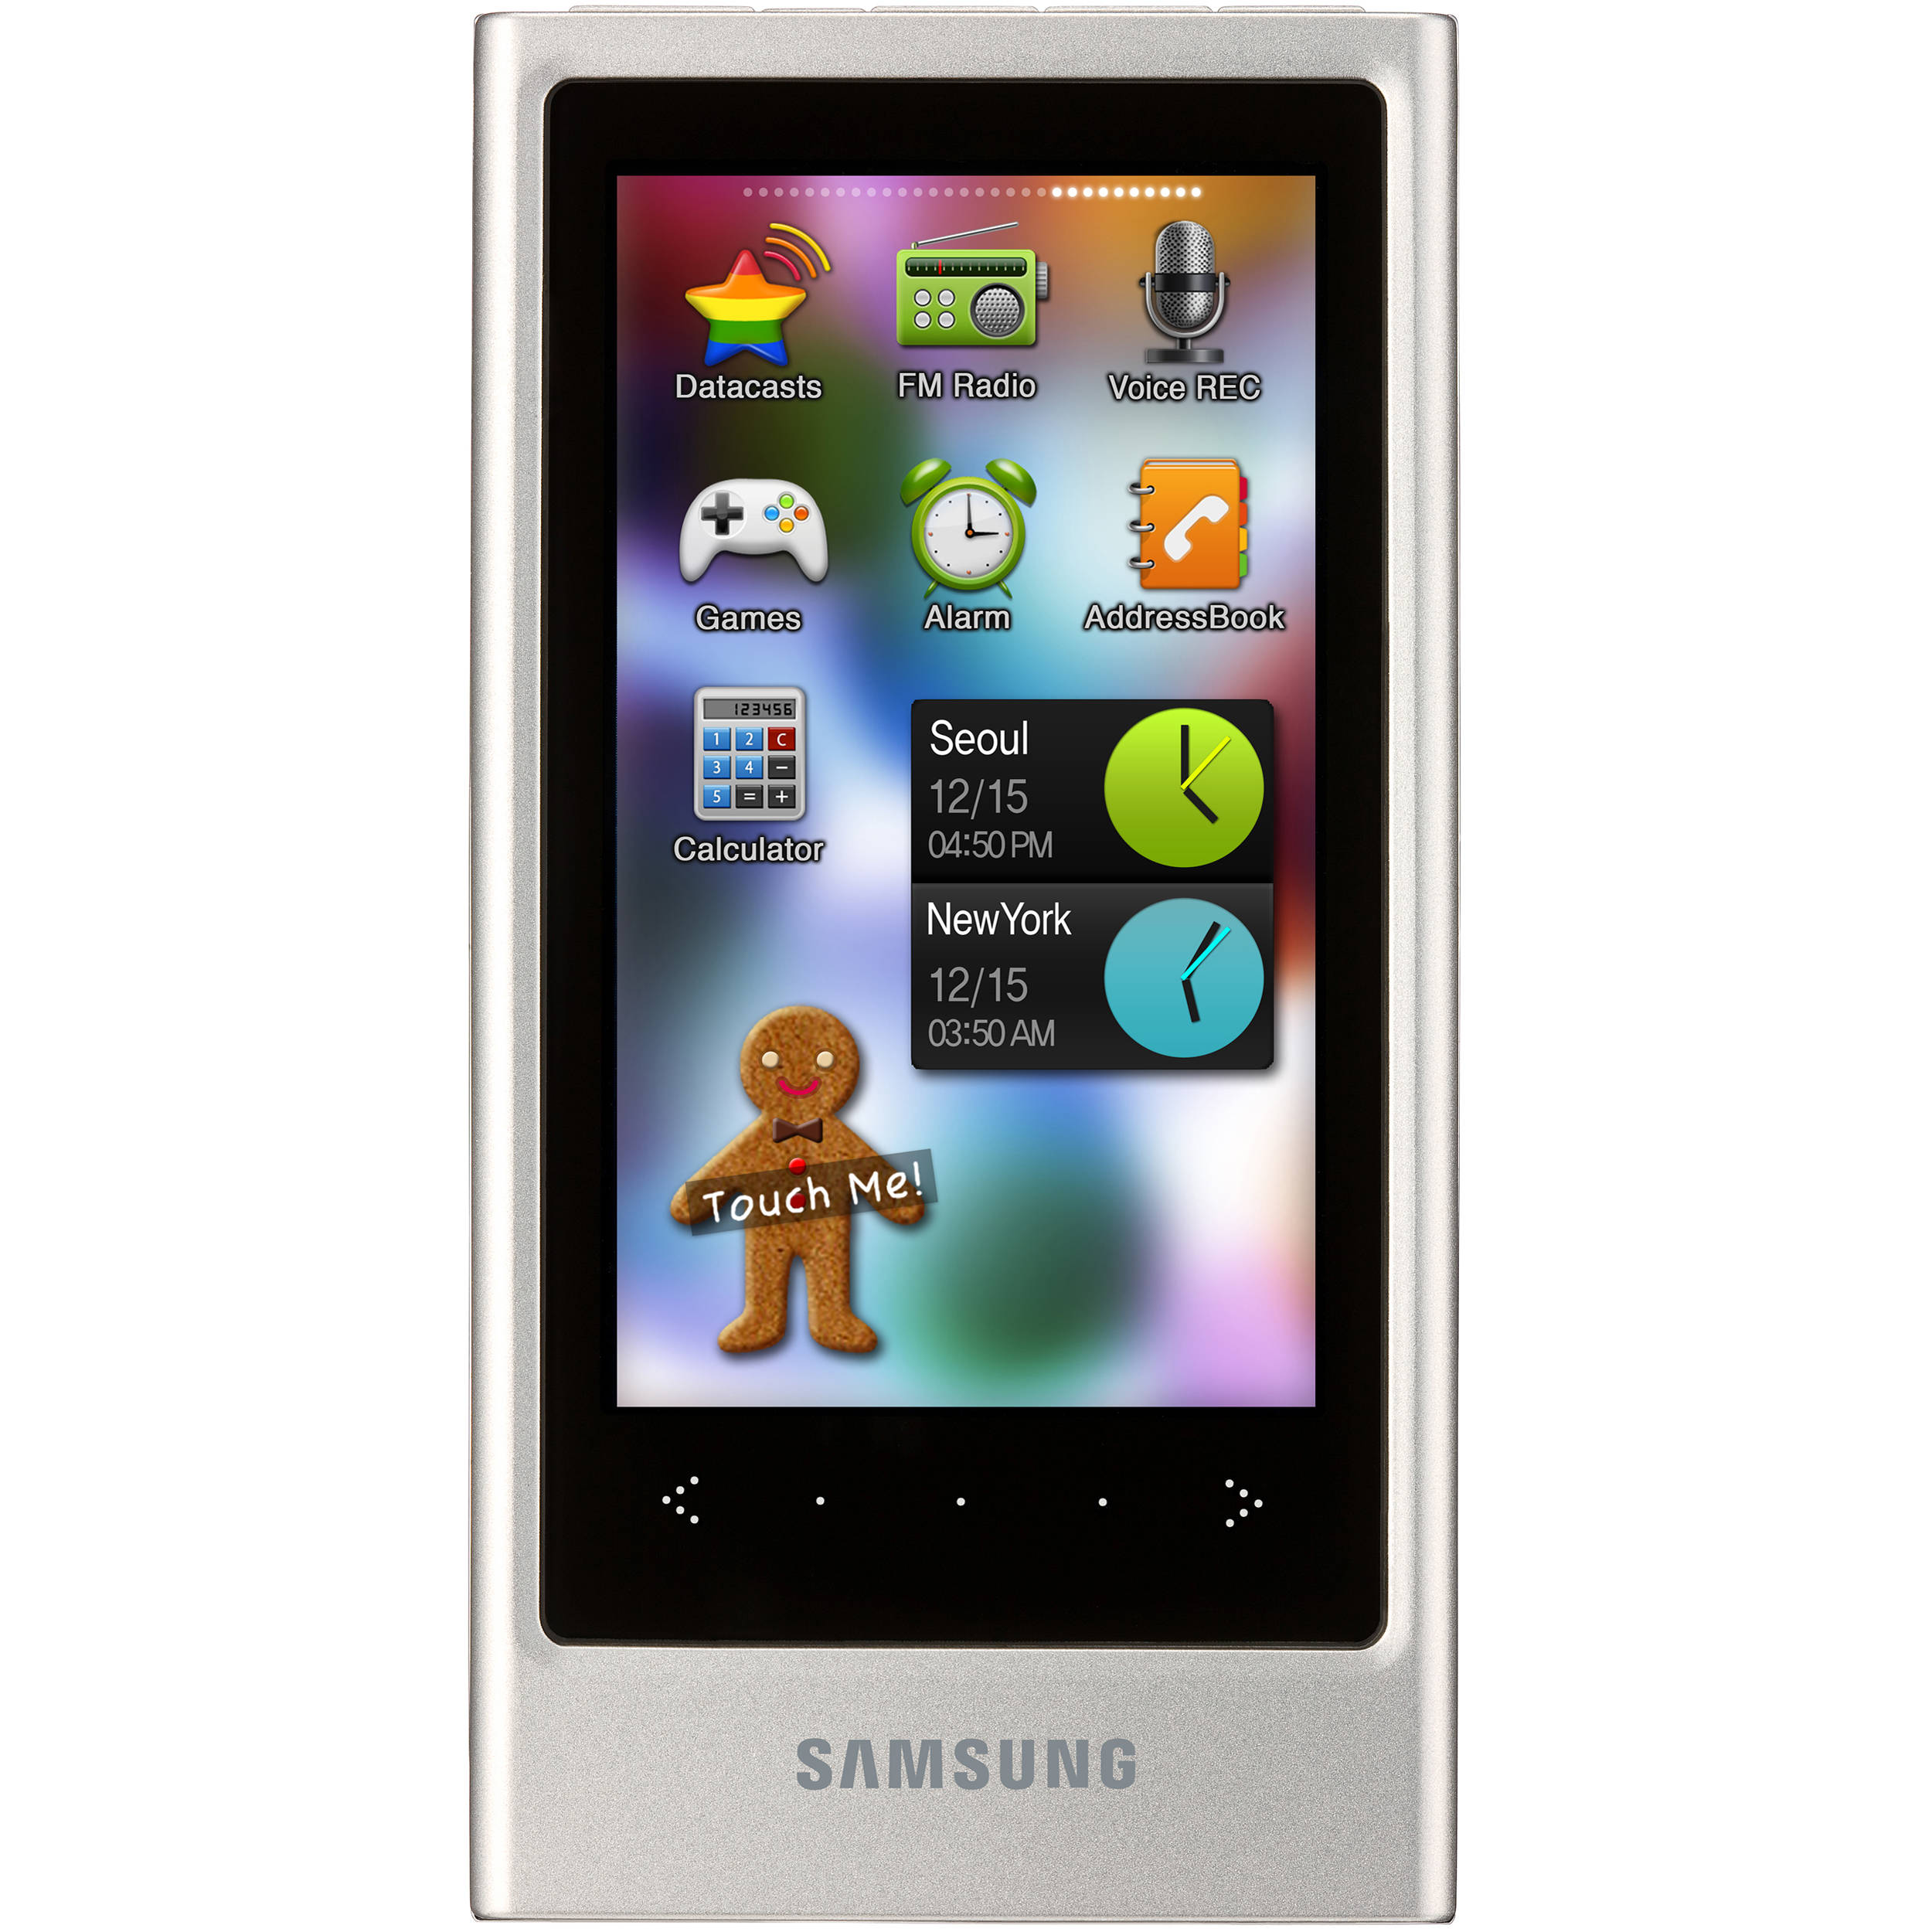 Телефон samsung 12 mp3 телефон samsung e 250 розового цвета